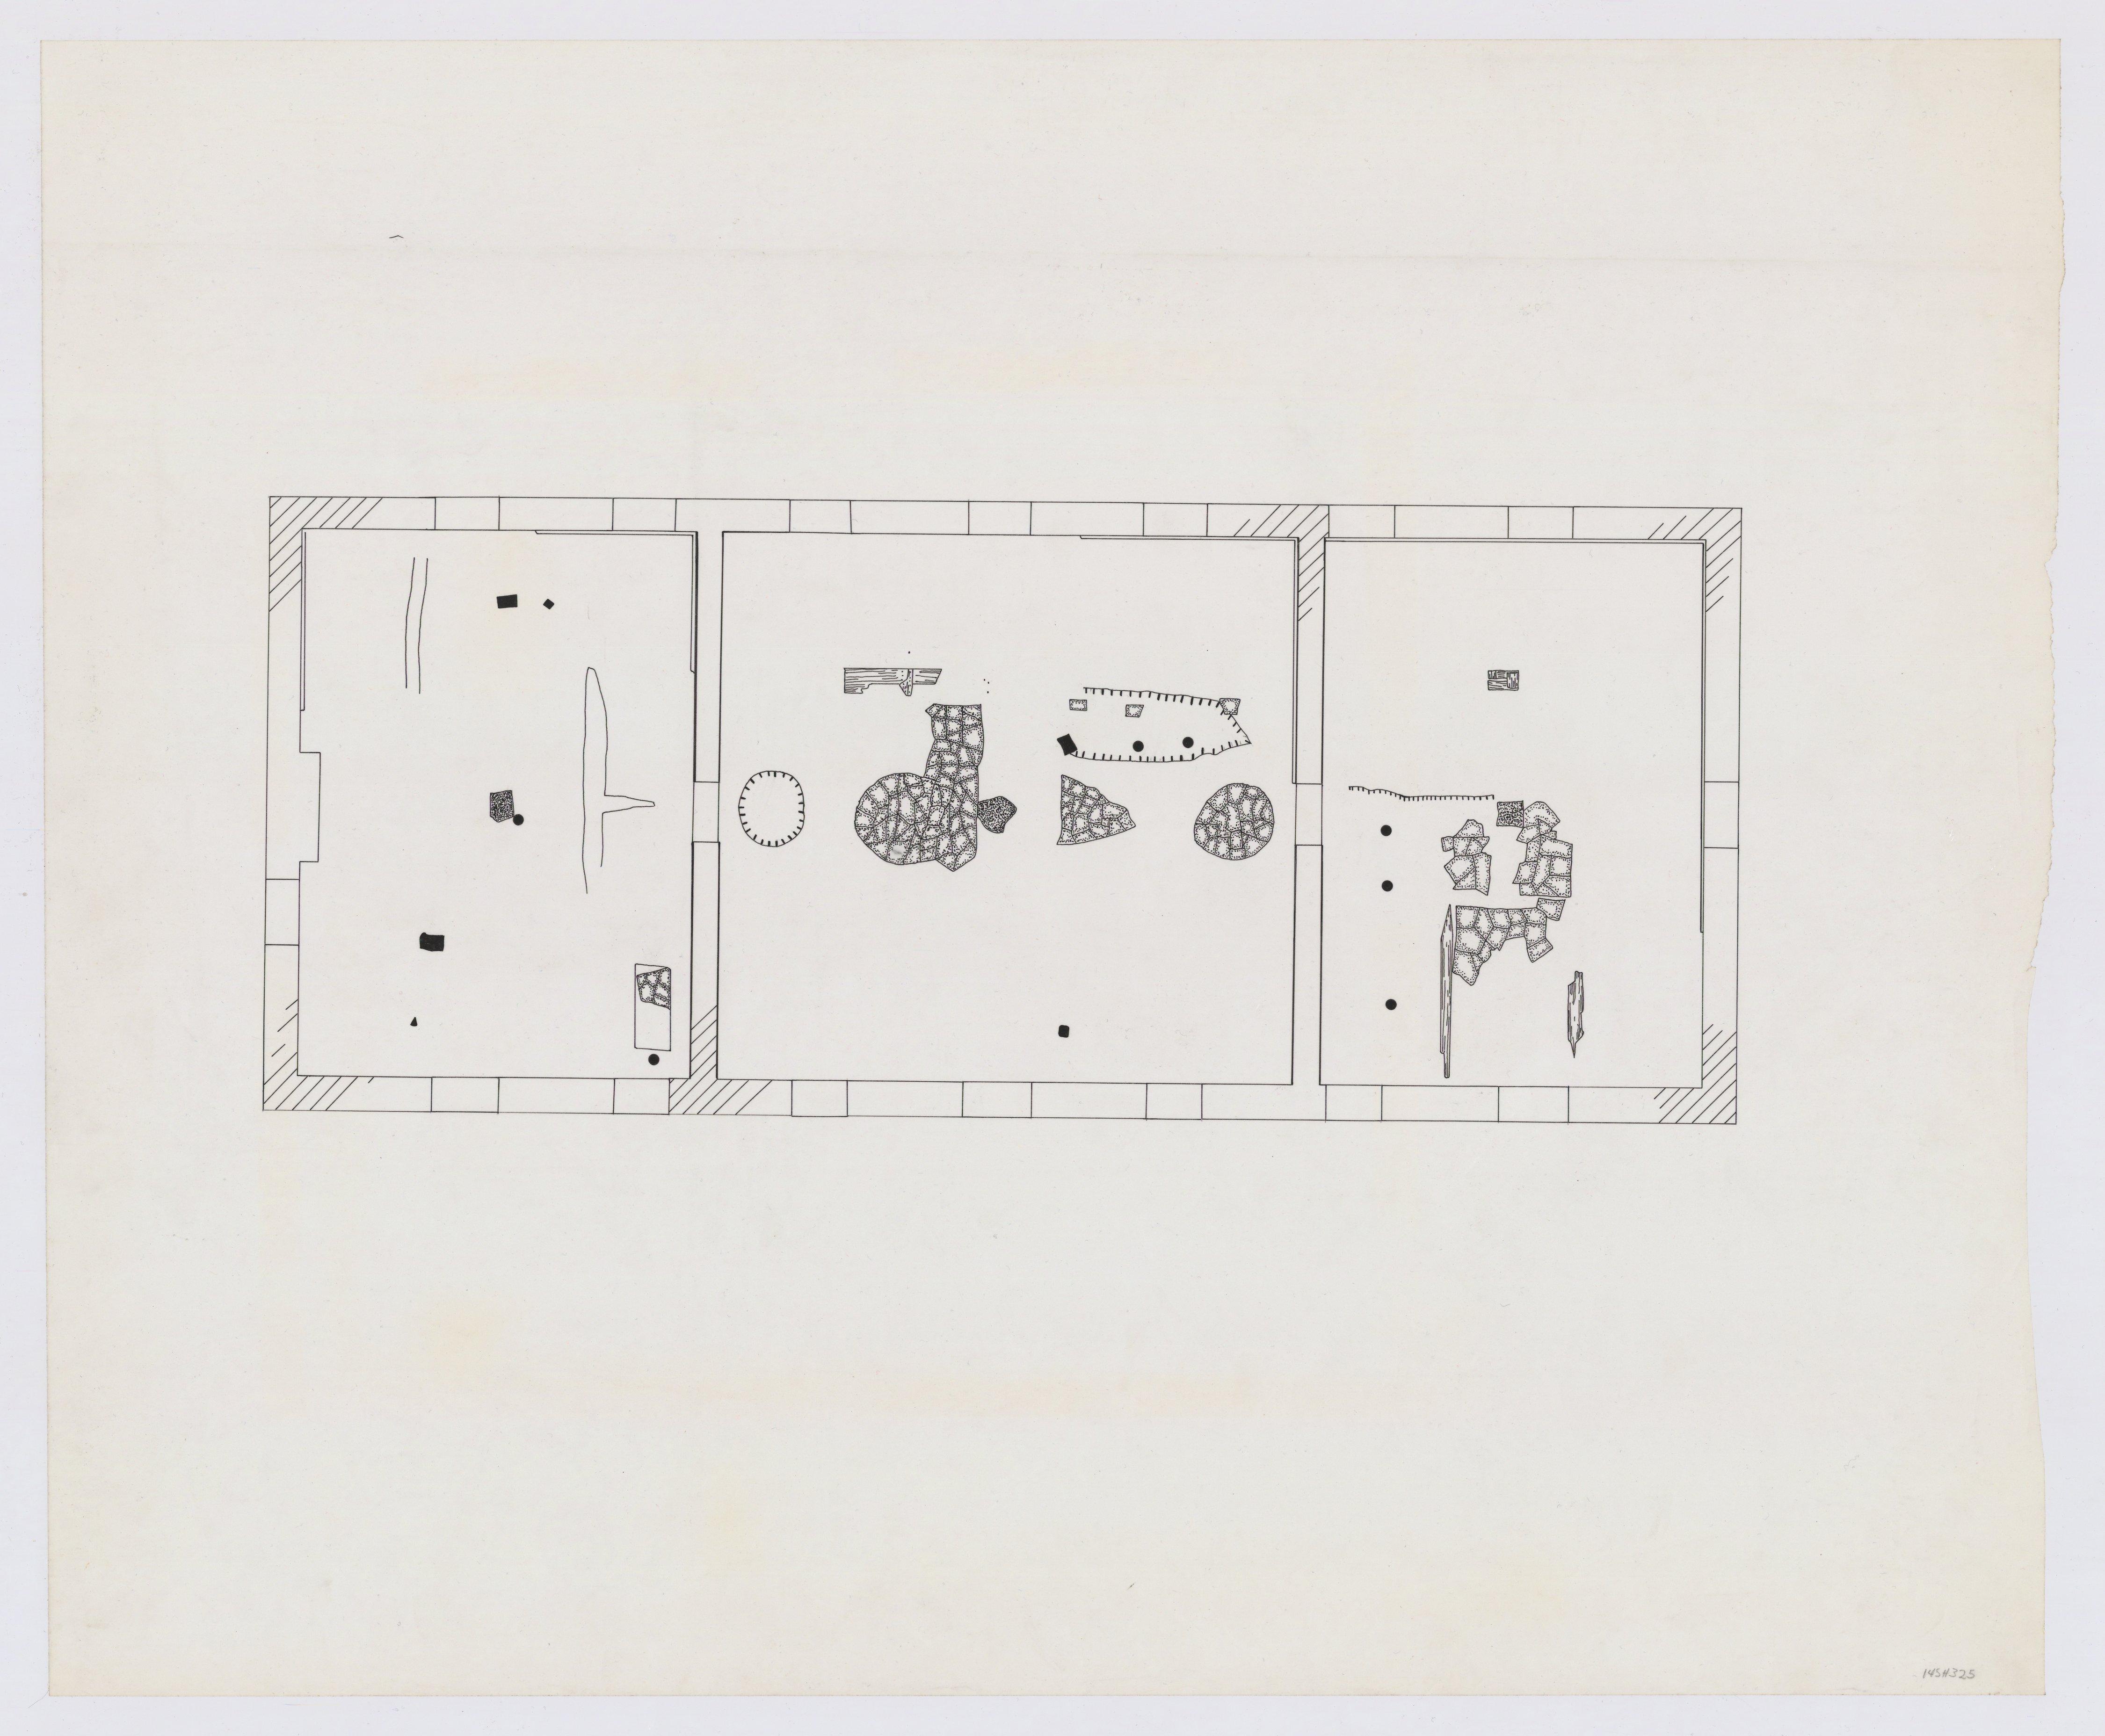 Oversized Maps of the Pottawatomi Mission, 14SH325 - 5